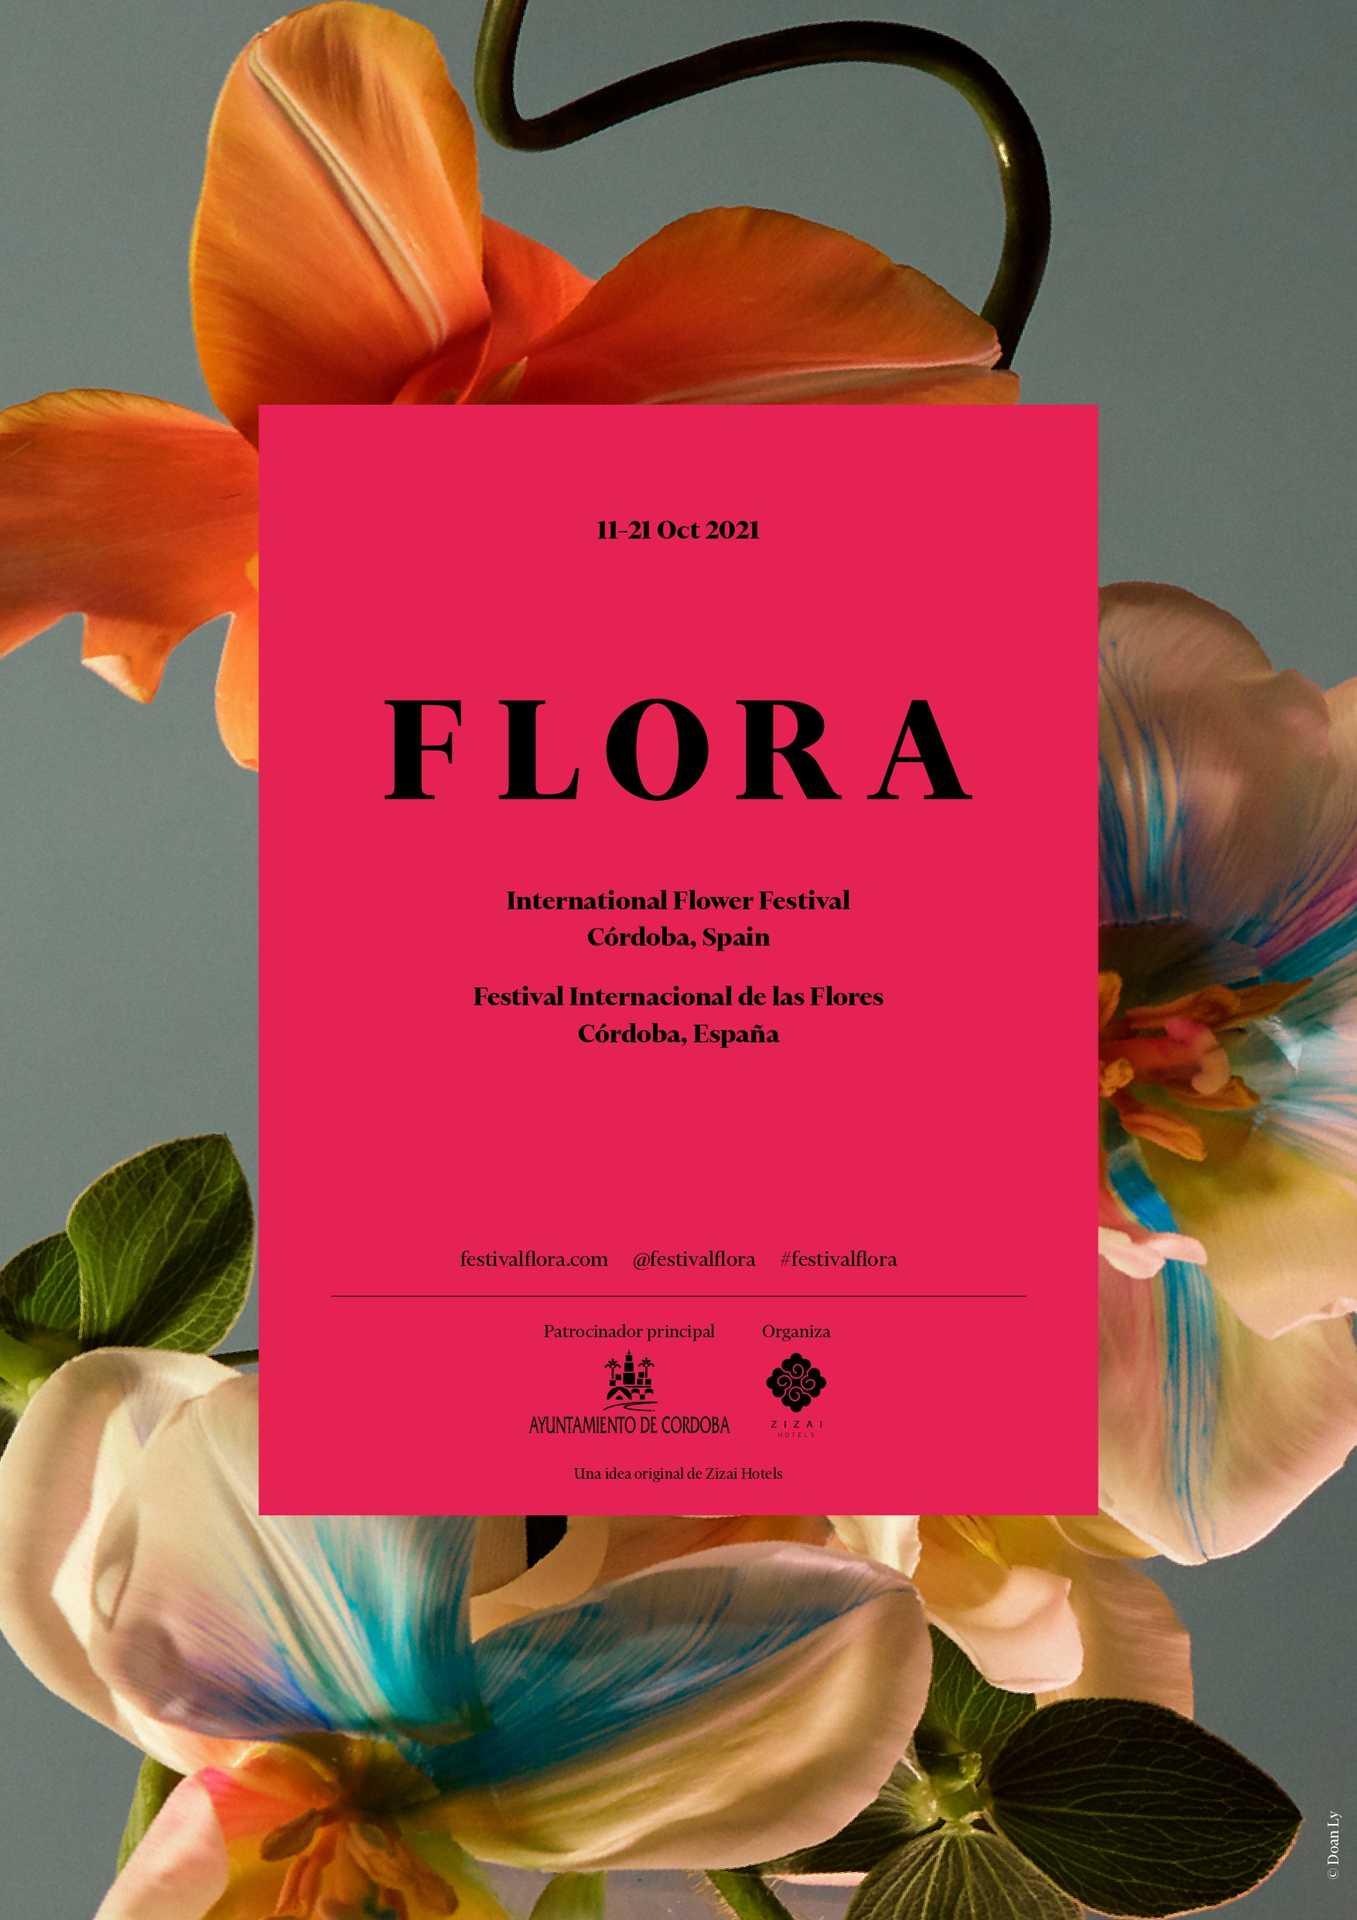 Flora - Internationales Blumenfestival